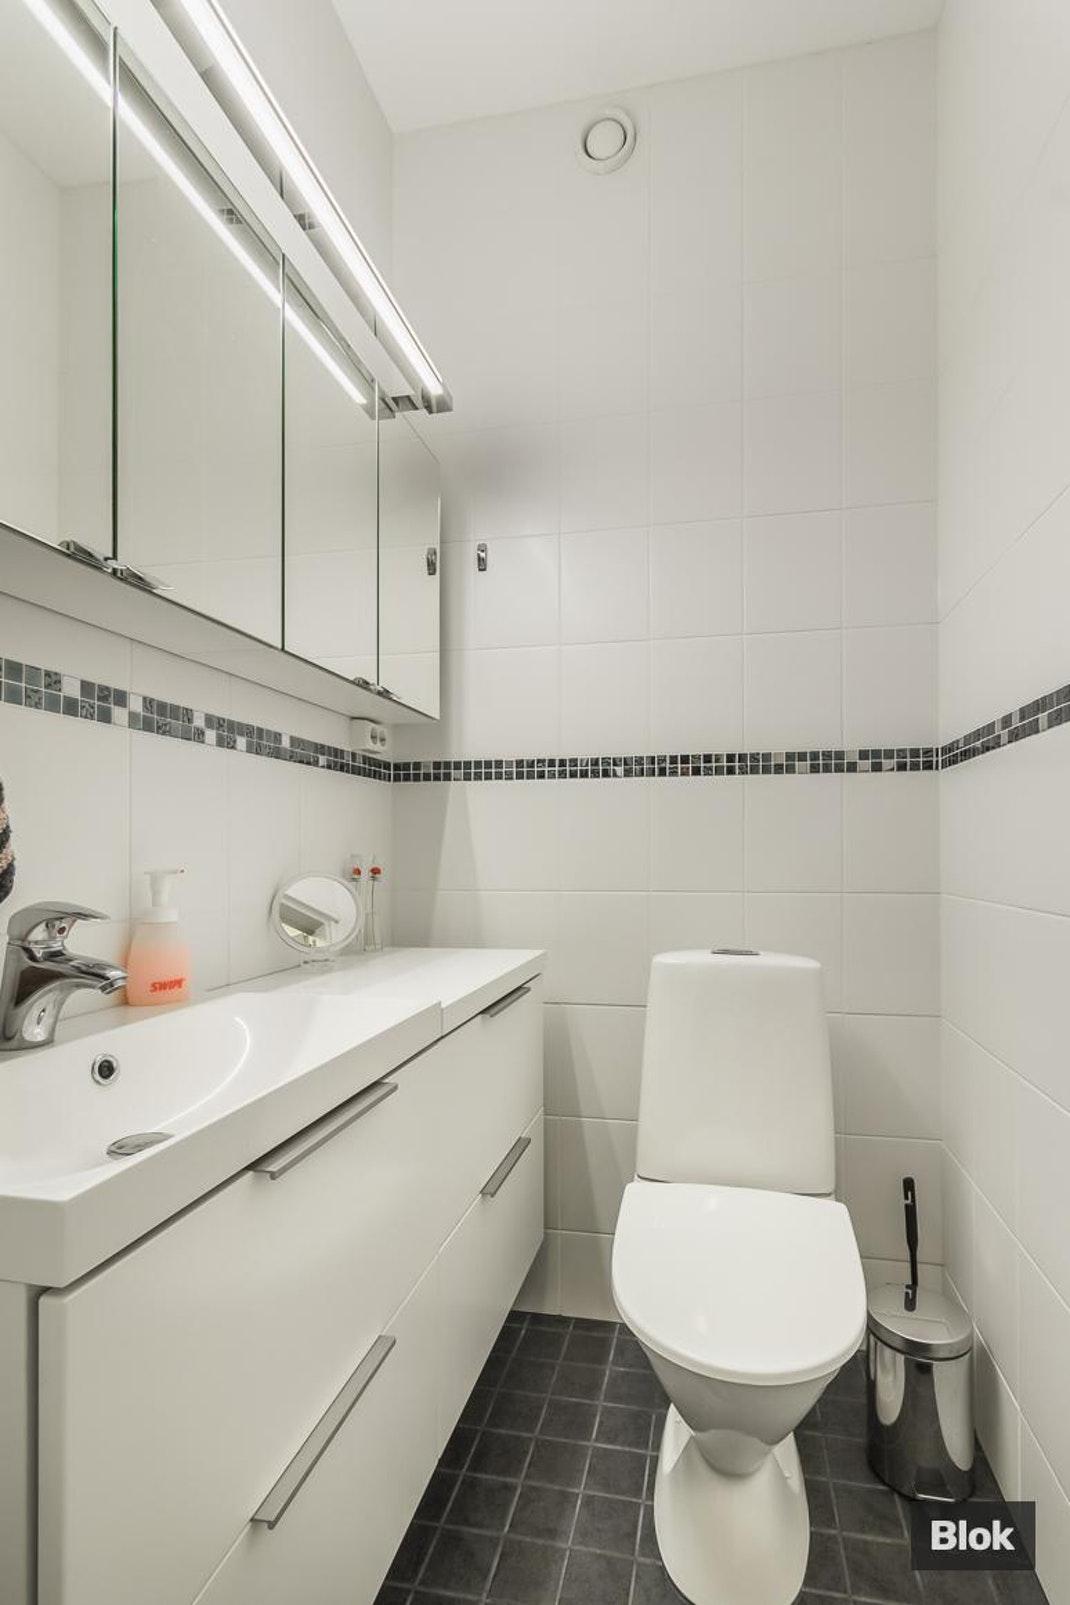 Upseerikerhonkatu 2 as. 4 Kylpyhuone & Sauna & Erillinen WC